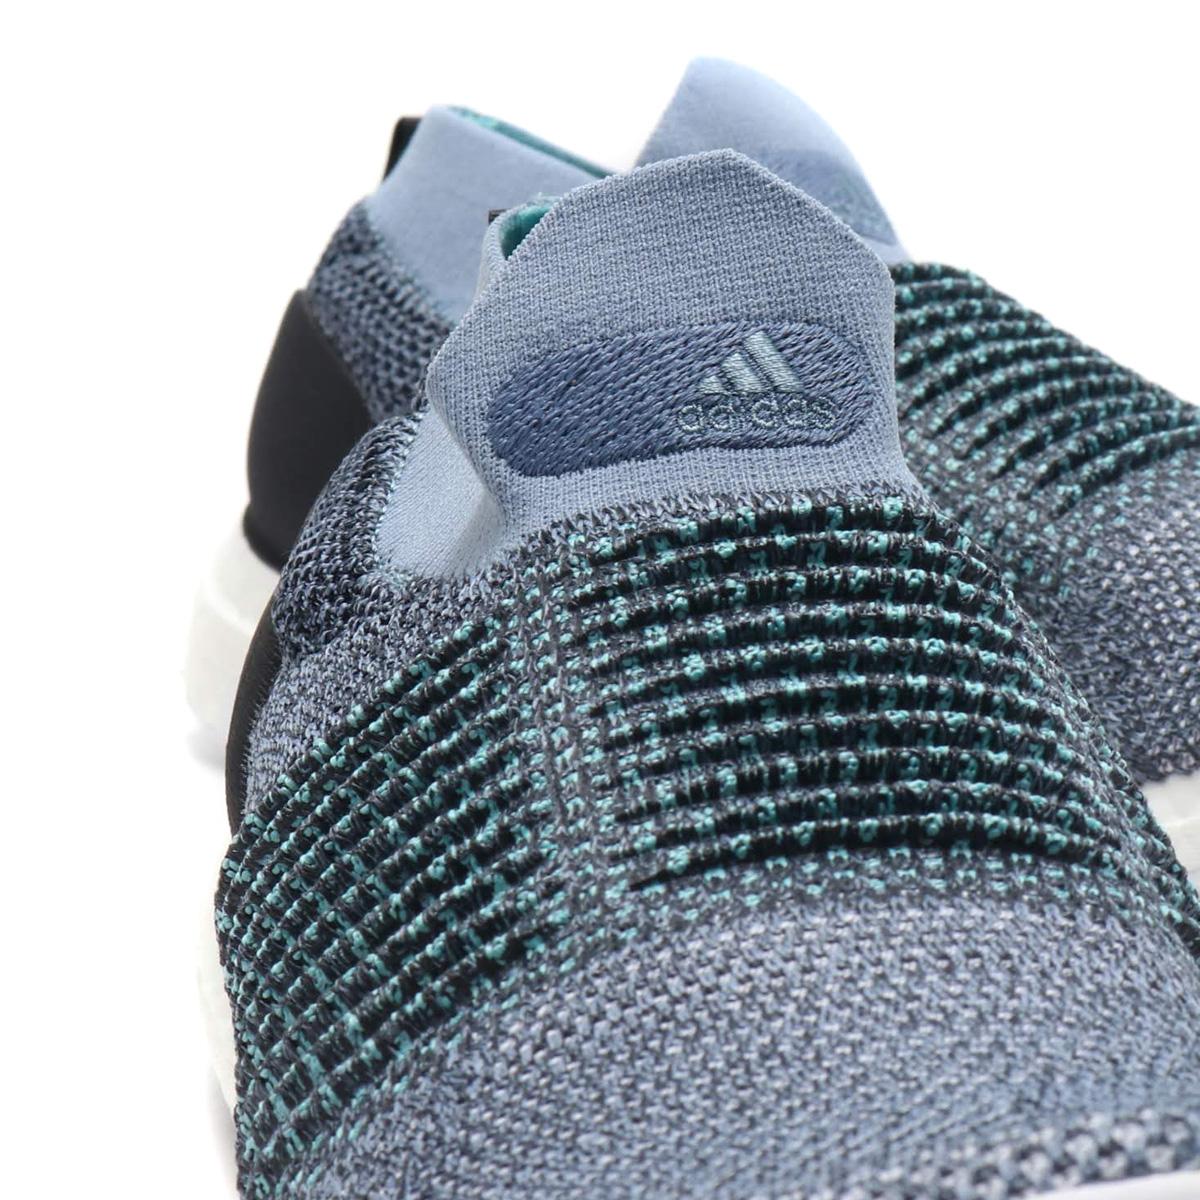 ab82524944ba8 adidas UltraBOOST LACELESS Parley (アディダスウルトラブーストレースレスパーレー) RAW GREY    CARBON   BLUE SPIRIT 18FW-I